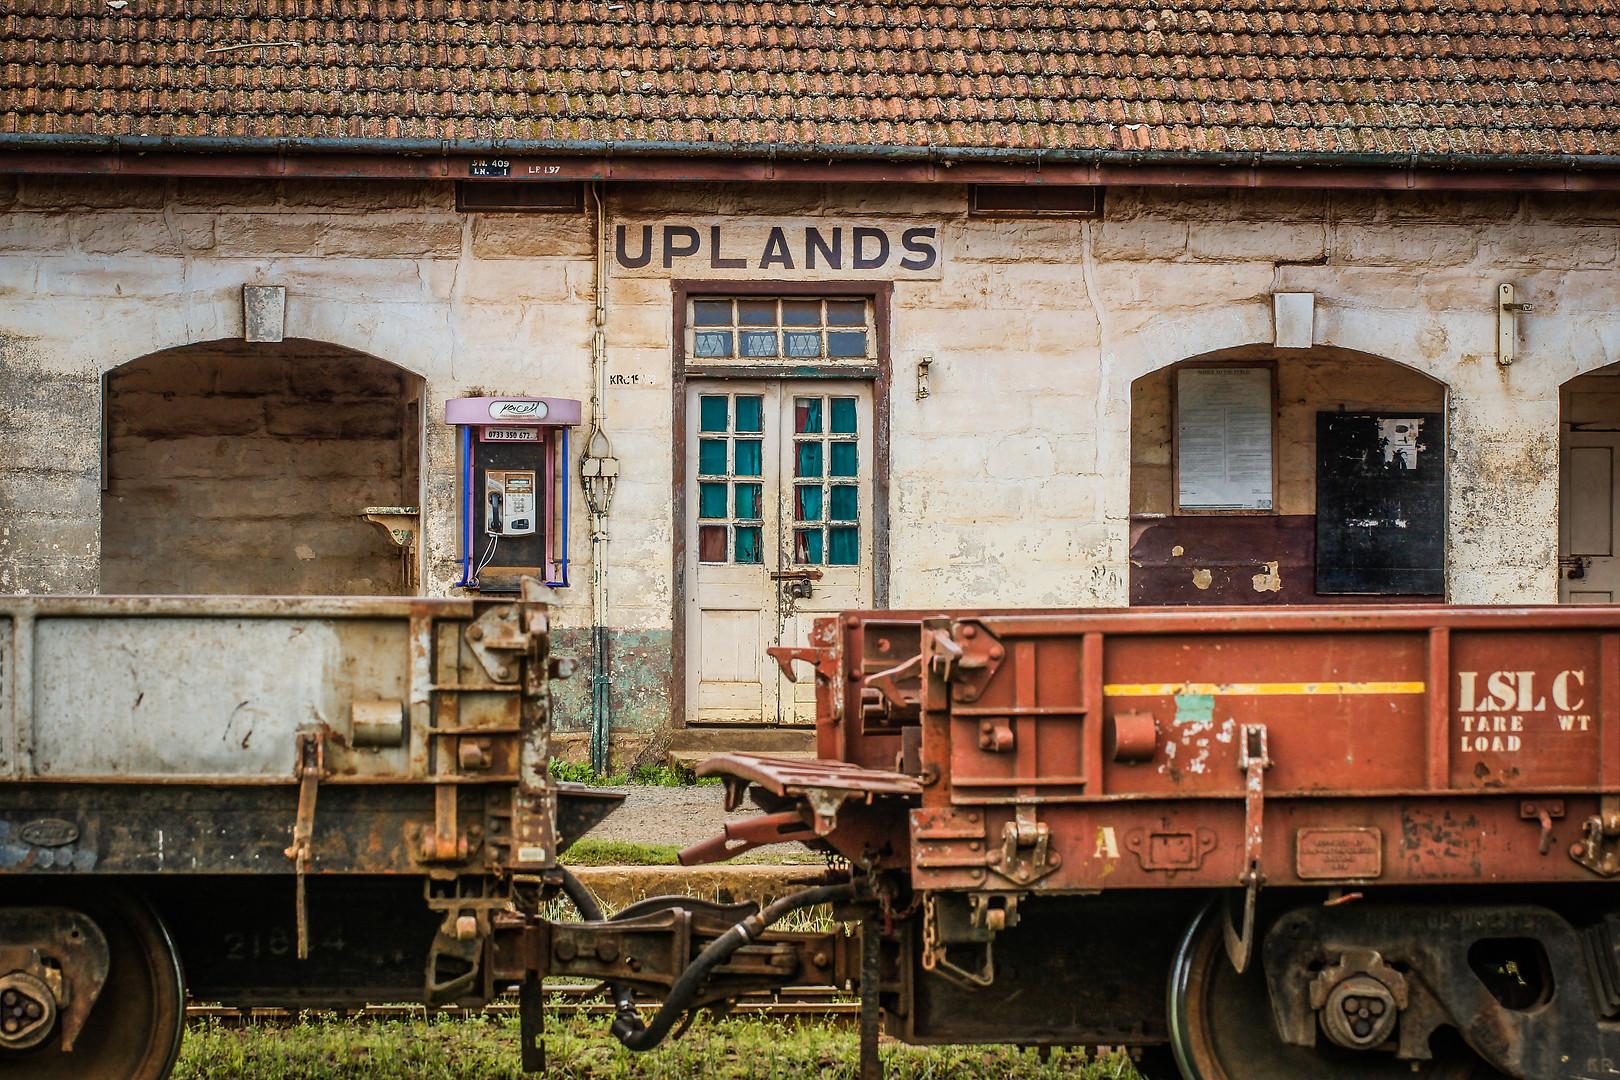 Uplands Railways Station